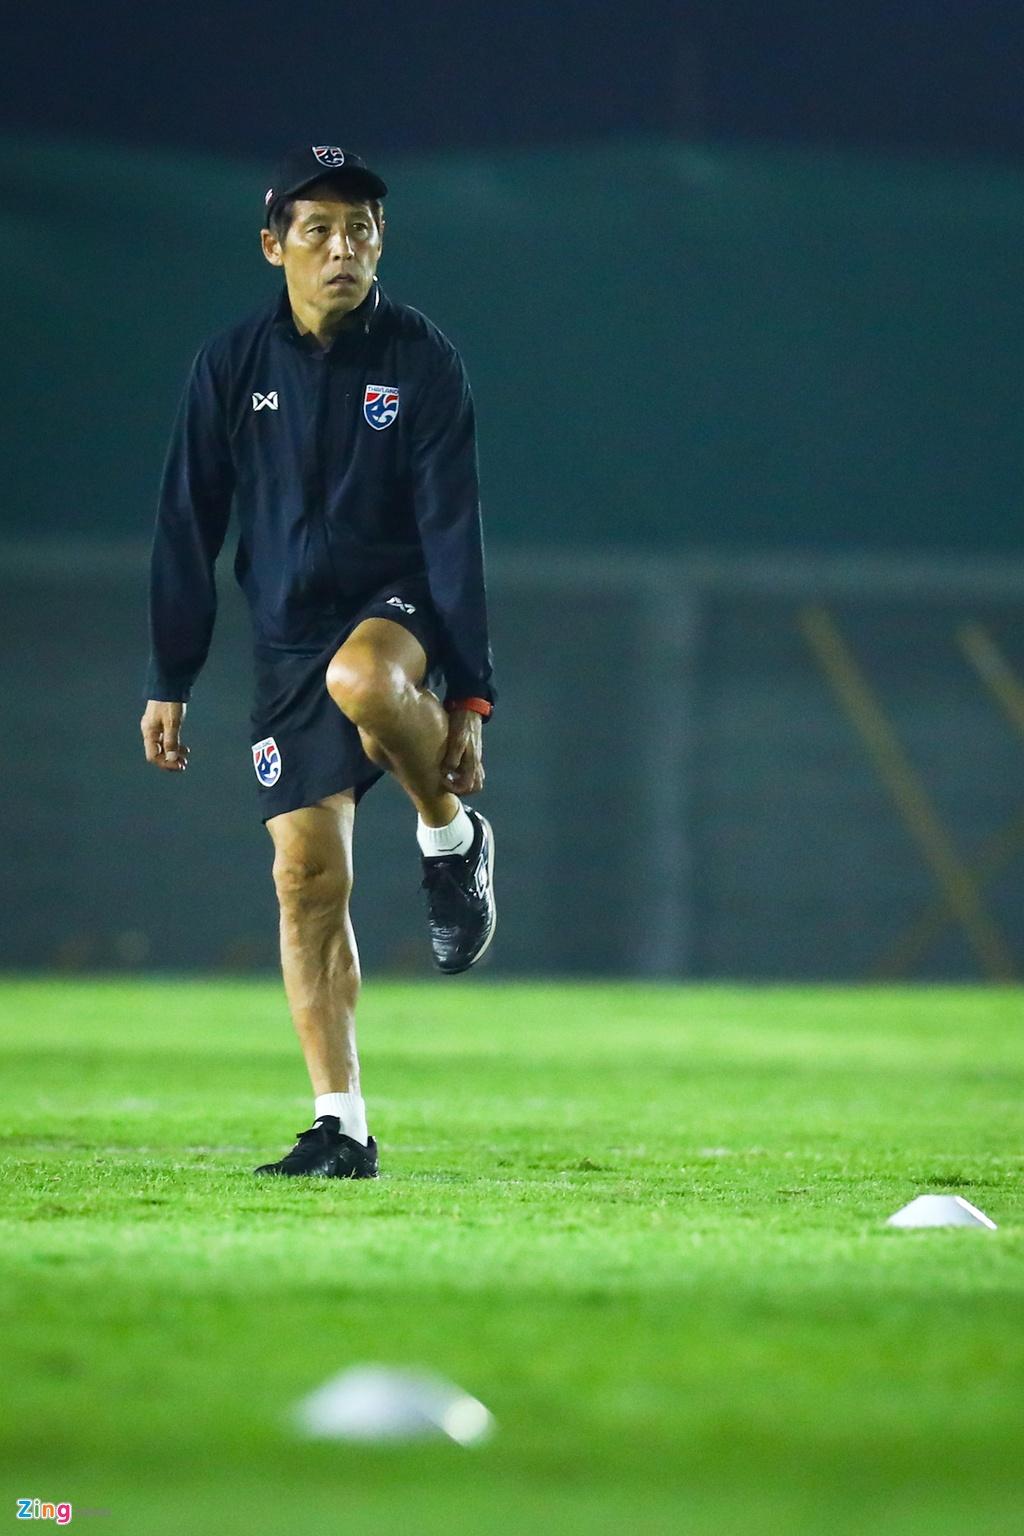 Cau thu thuoc bien che Fulham khong canh tranh duoc o U23 Thai Lan hinh anh 2